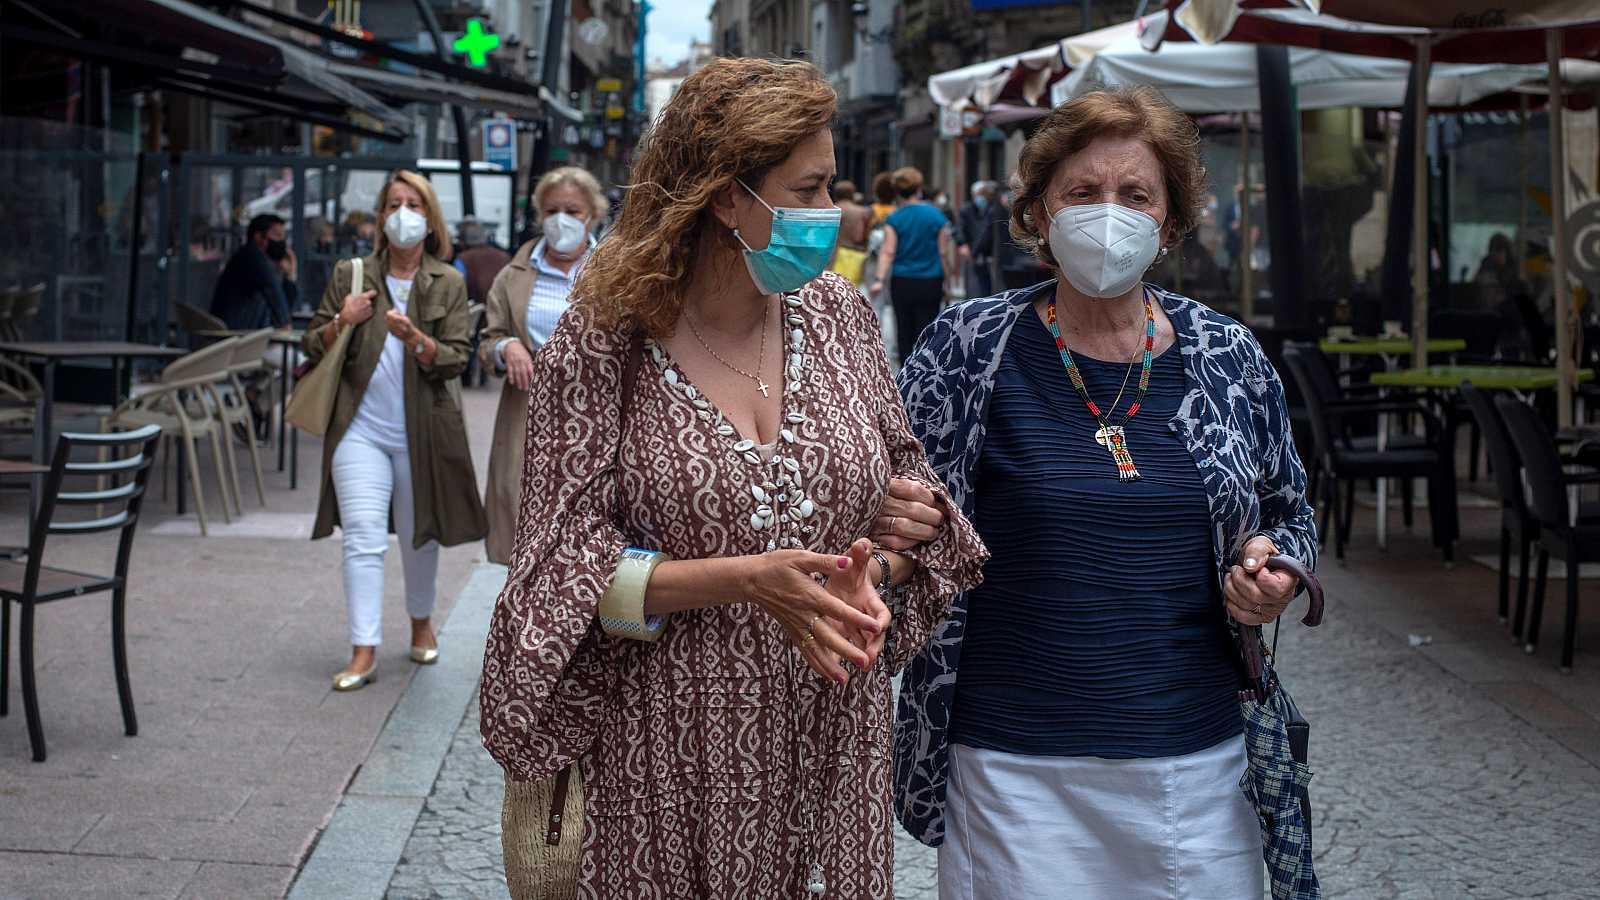 Dos mujeres caminan con mascarilla por la calle